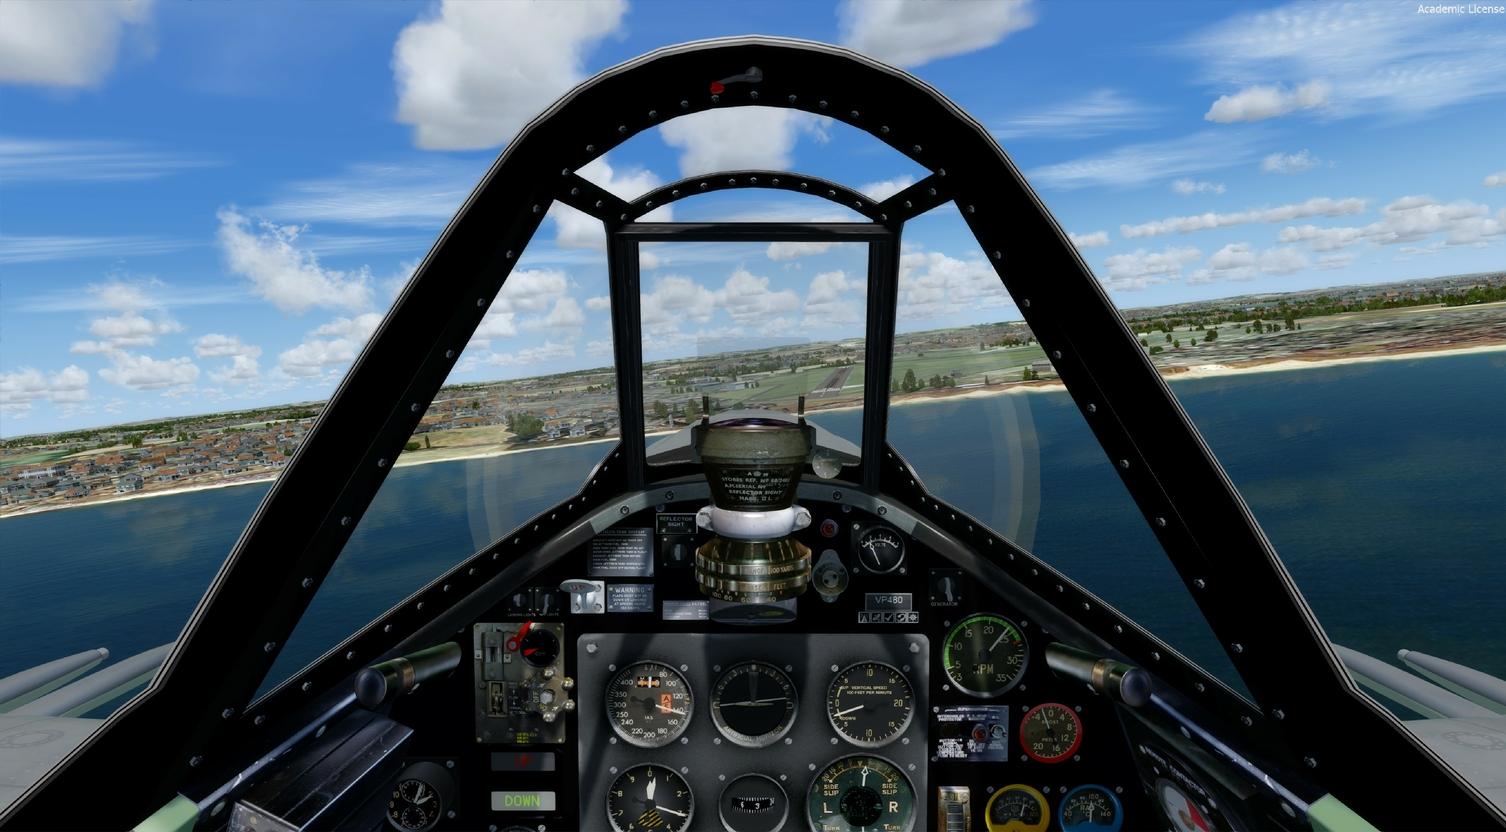 Seafire-FSX release-Freeware - Microsoft Flight Simulator - CombatACE